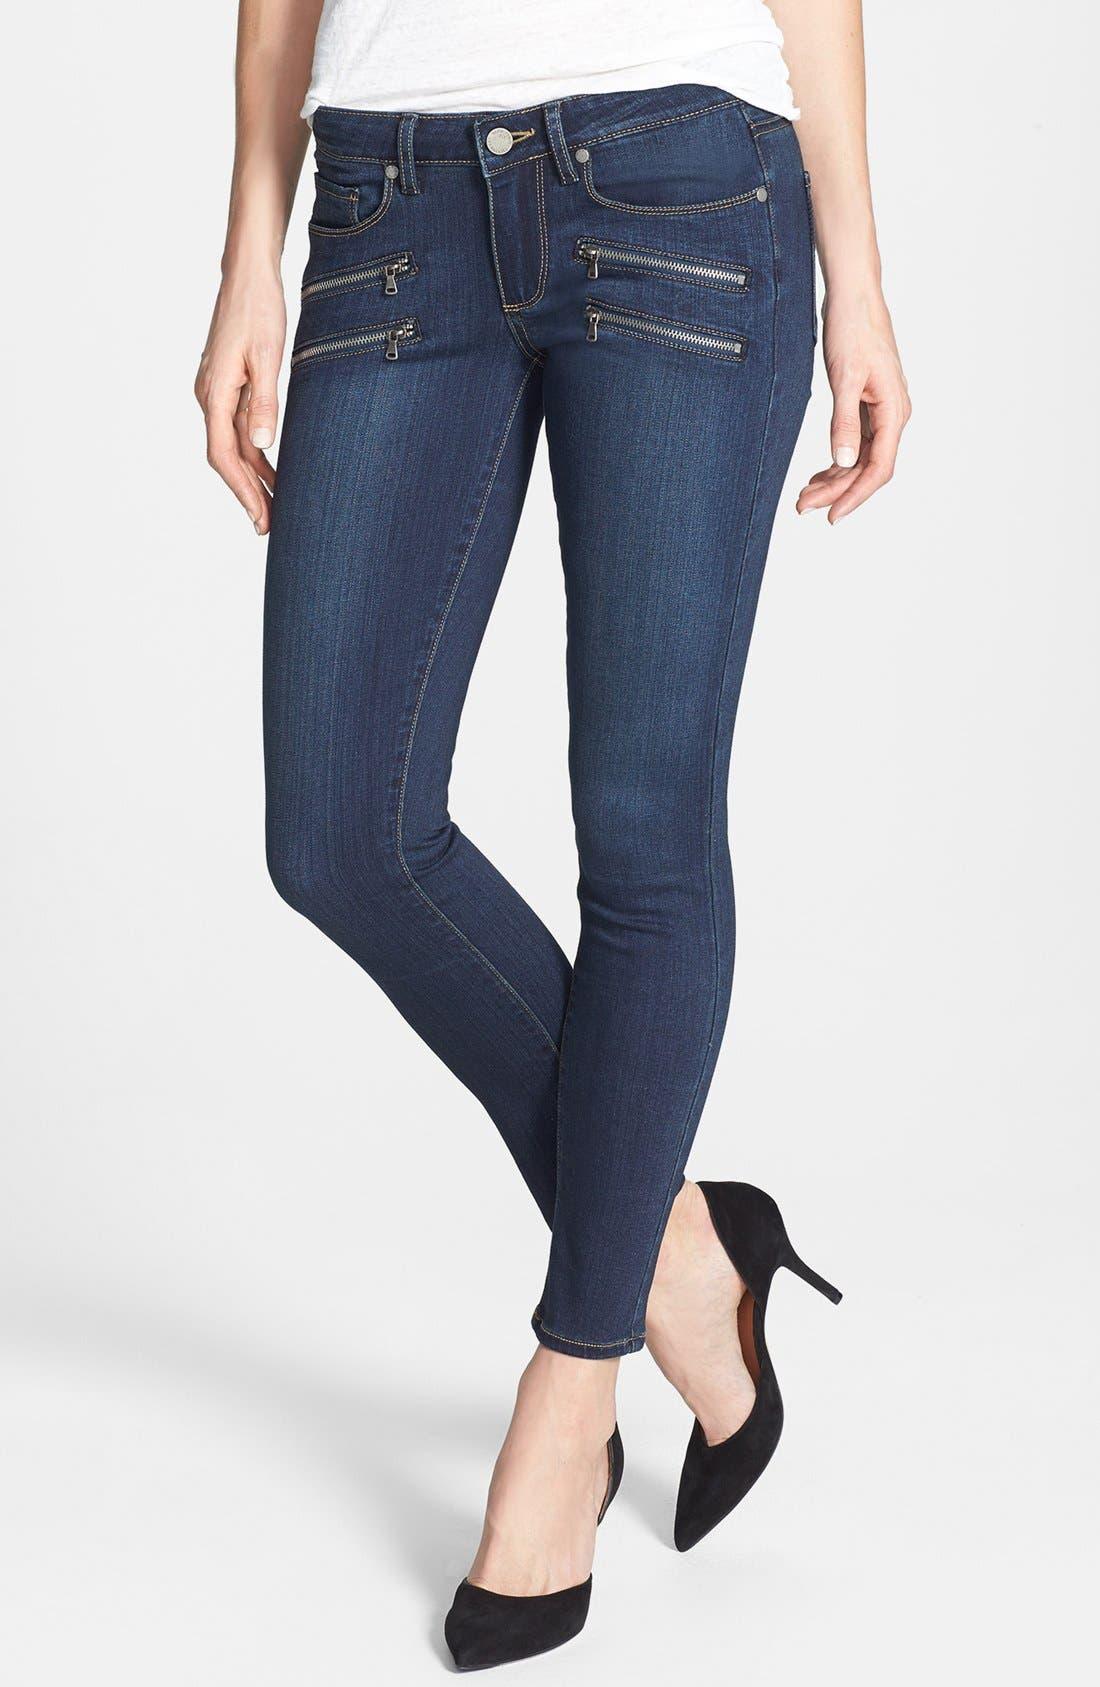 Transcend - Edgemont Zip Detail Ultra Skinny Jeans,                             Main thumbnail 1, color,                             400